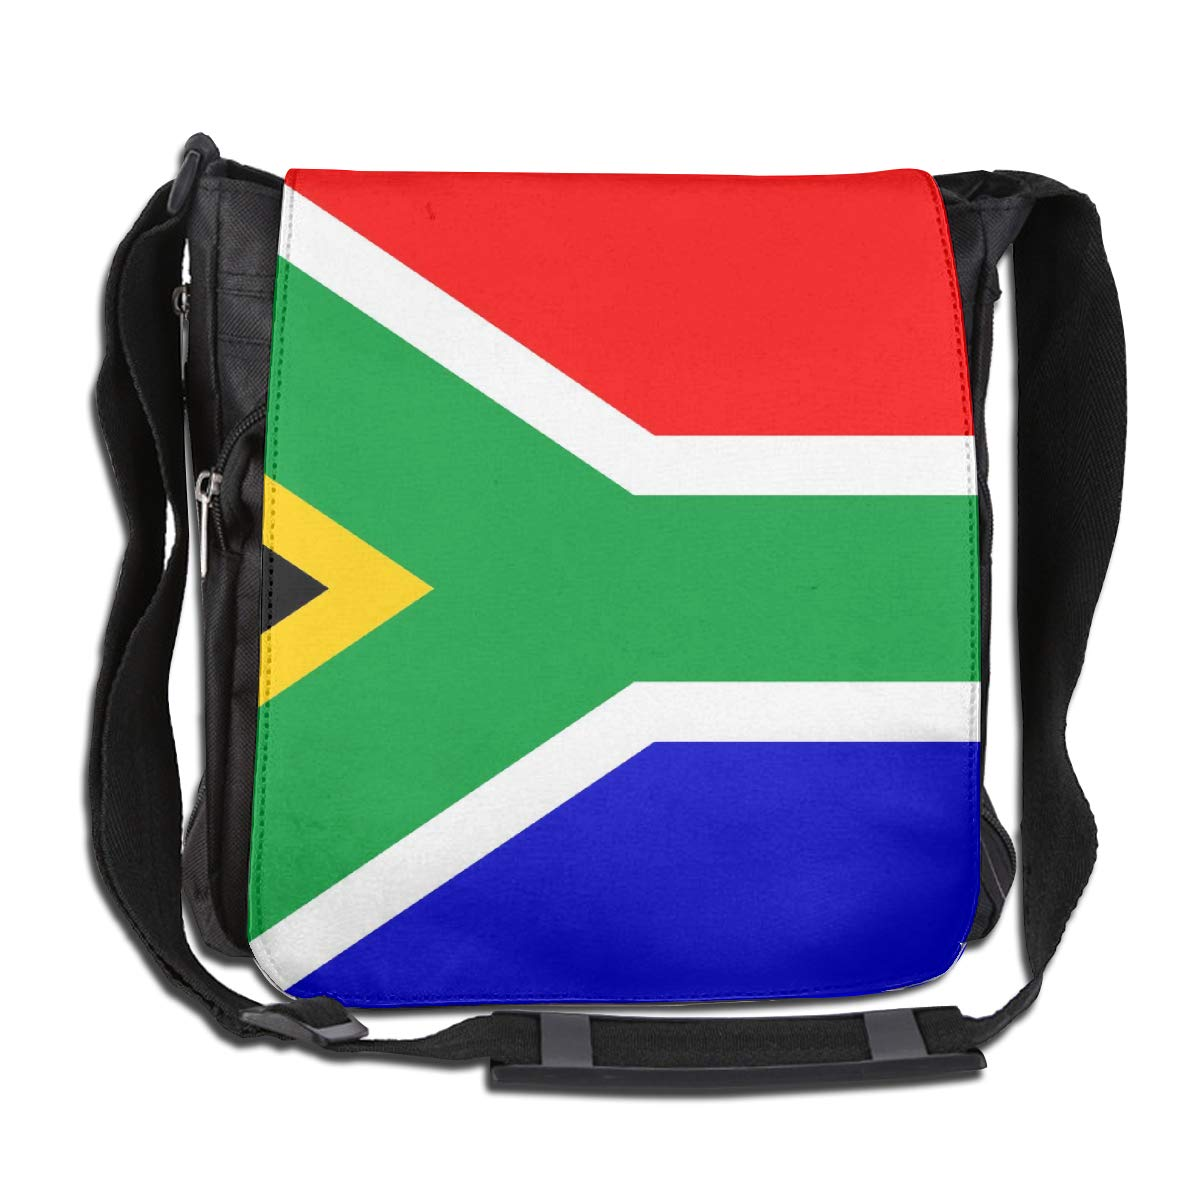 South Africa Flag Crossbody Shoulder Bag Durable Casual Daily Messenger Bag Satchel School Bag For Women And Men